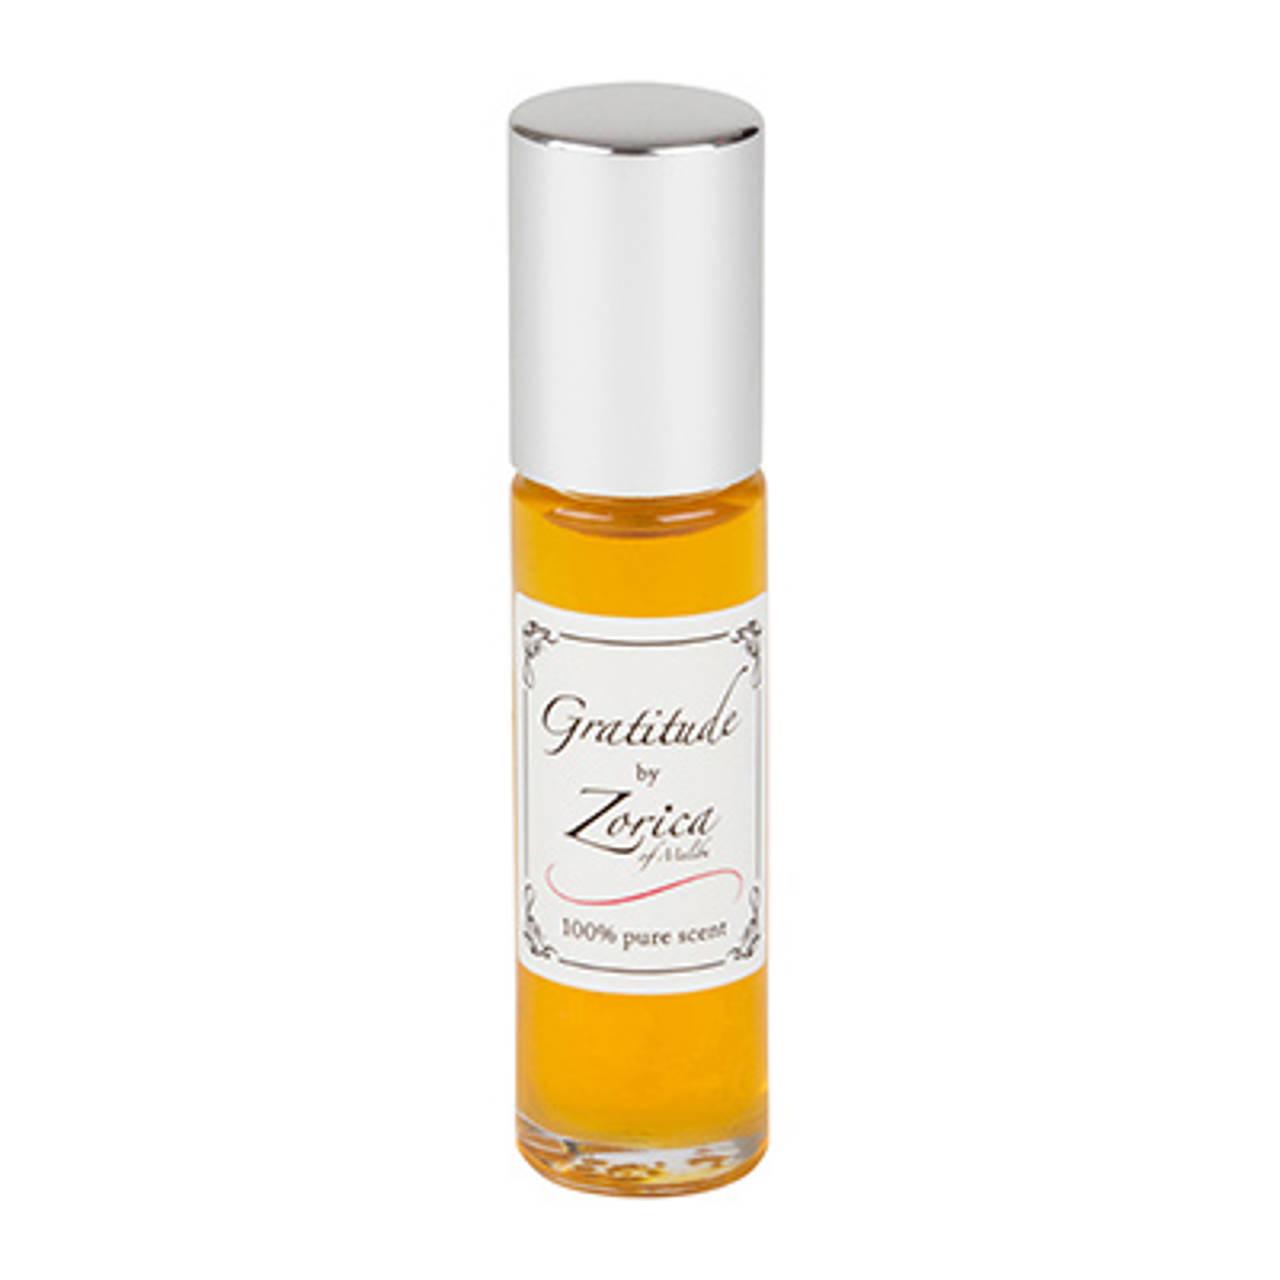 Free Sample - Gratitude Pure Perfume